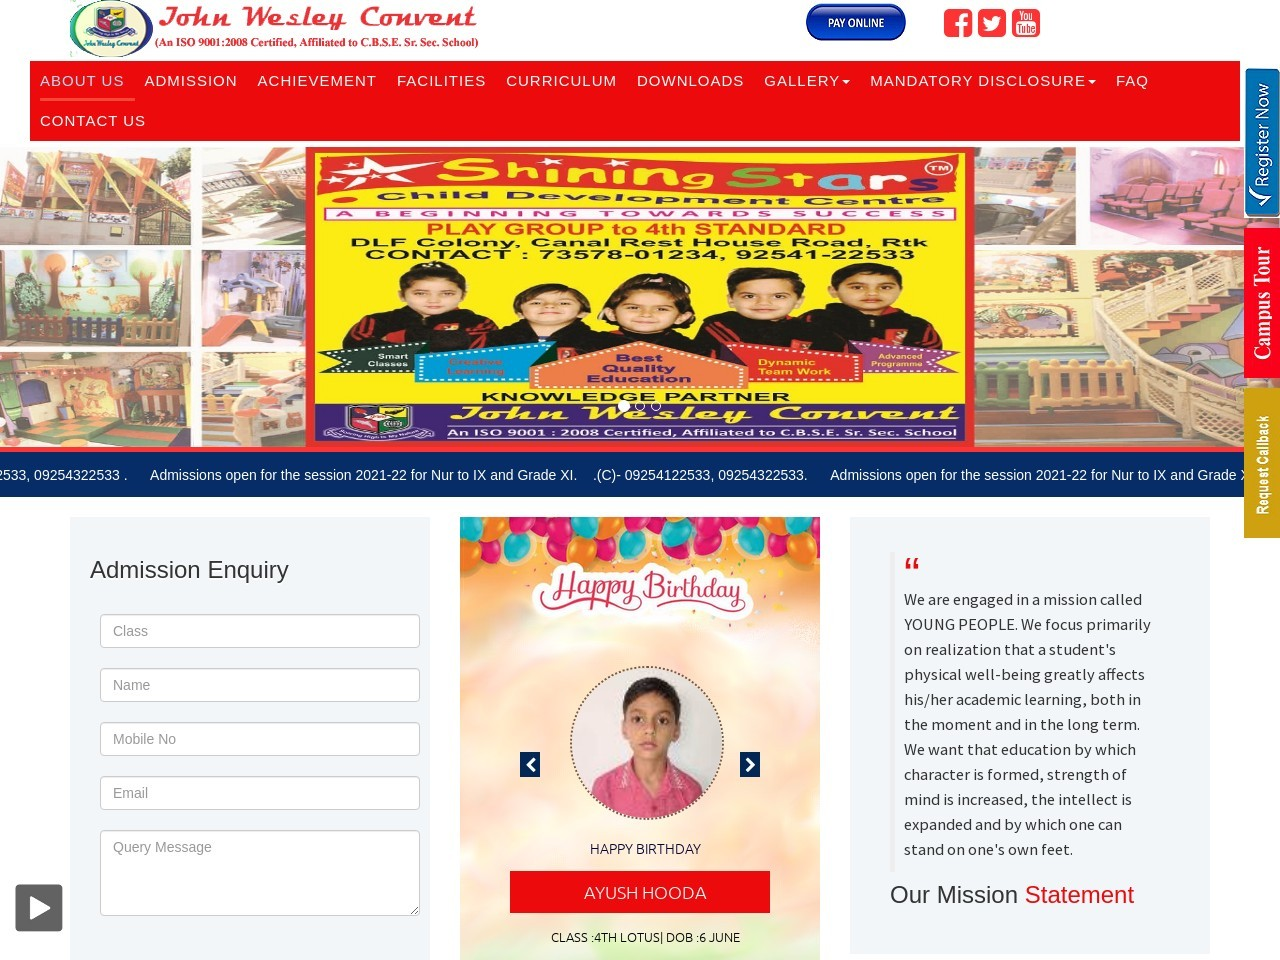 Top 10 School in Rohtak, Haryana, Best English medium – johnwesleyconvent.com